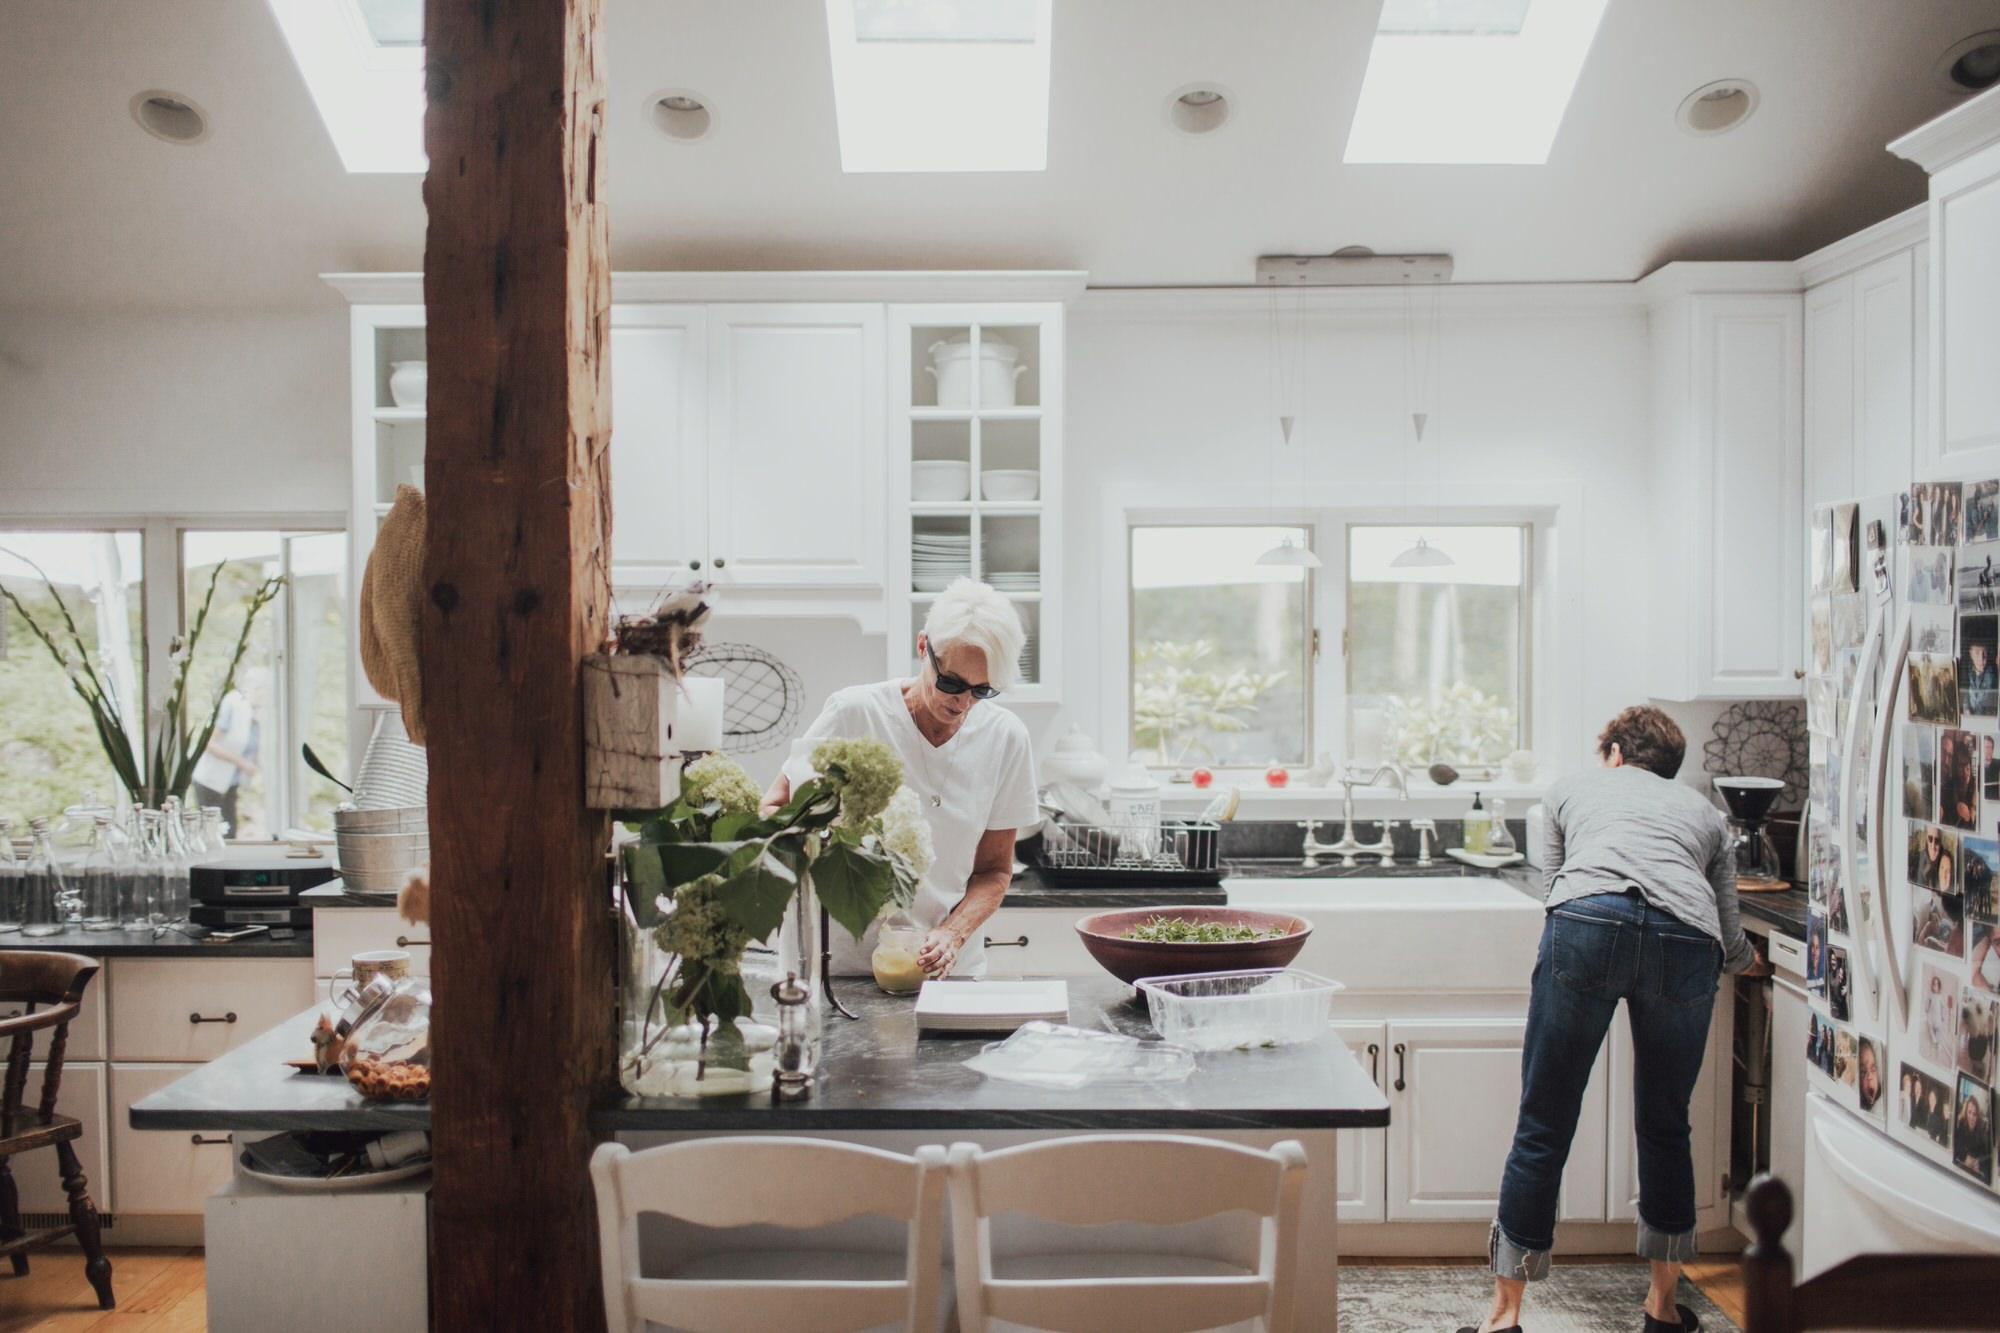 amazing kitchen layout